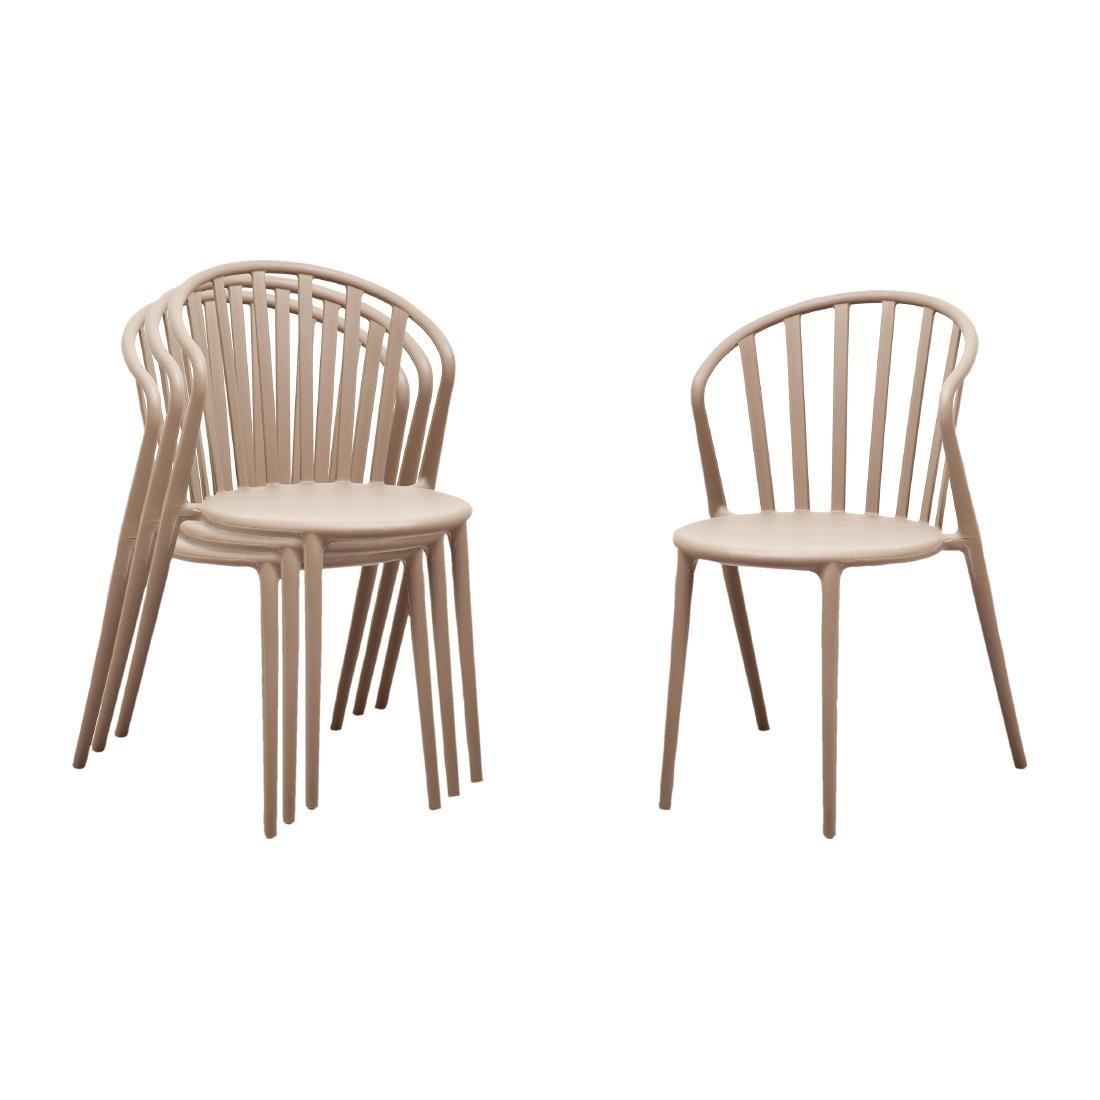 Slatted Armchair - White